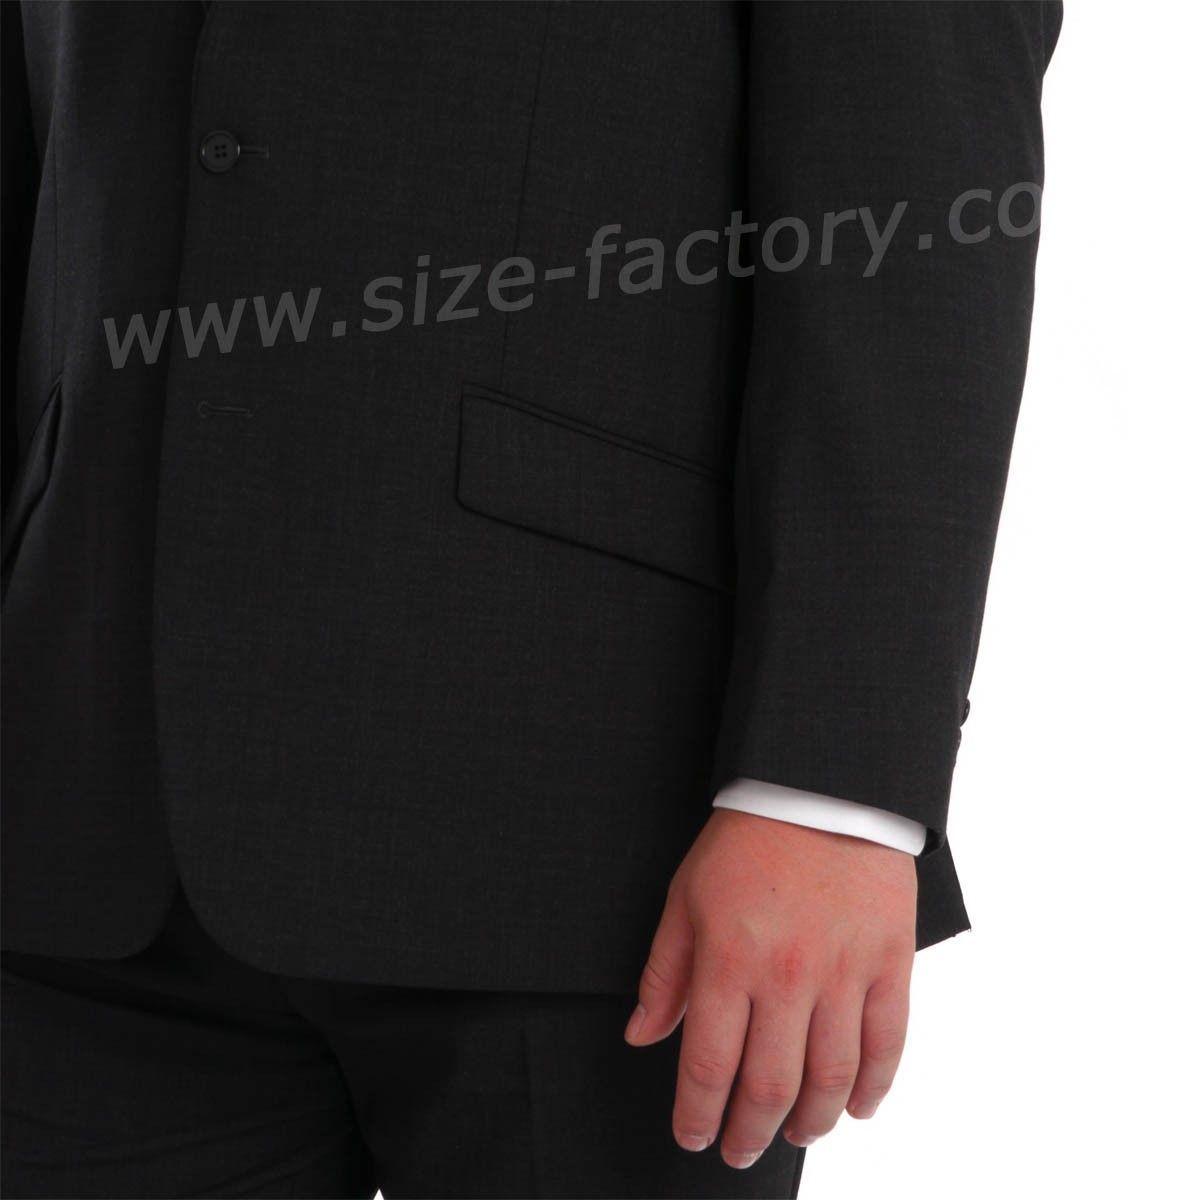 costume grande taille gris classic pour homme fort nouveau size factory skopes. Black Bedroom Furniture Sets. Home Design Ideas